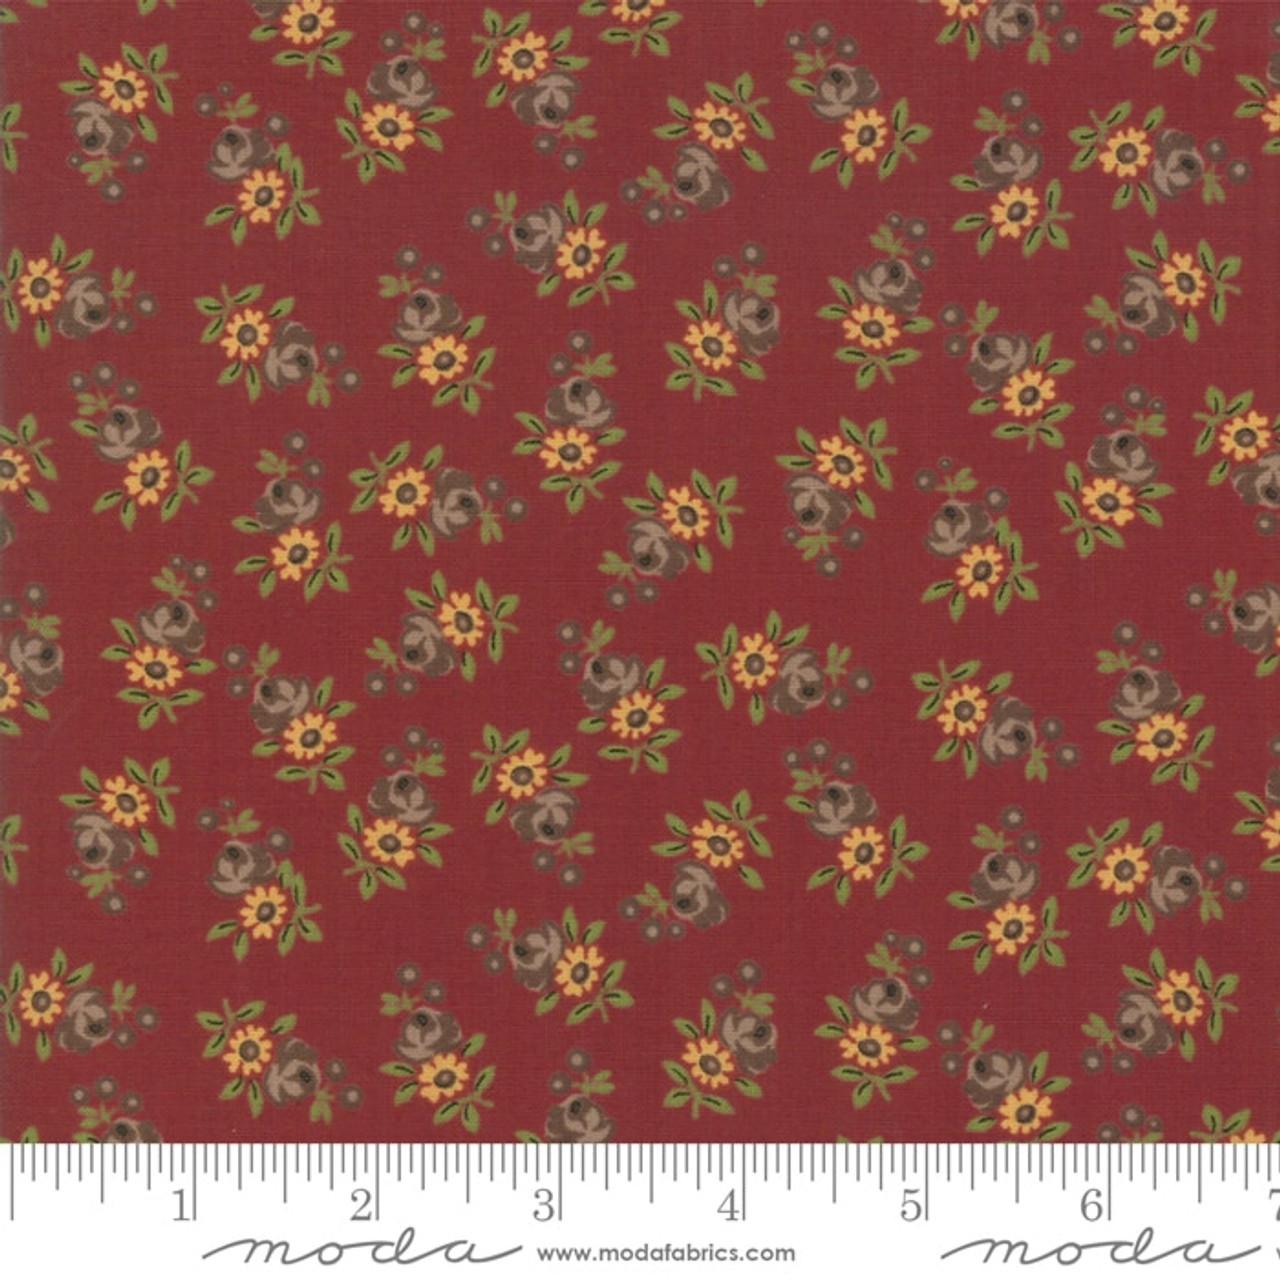 Betsy Chutchian : Nancys Needle, Prairie Flowers, Berry Red